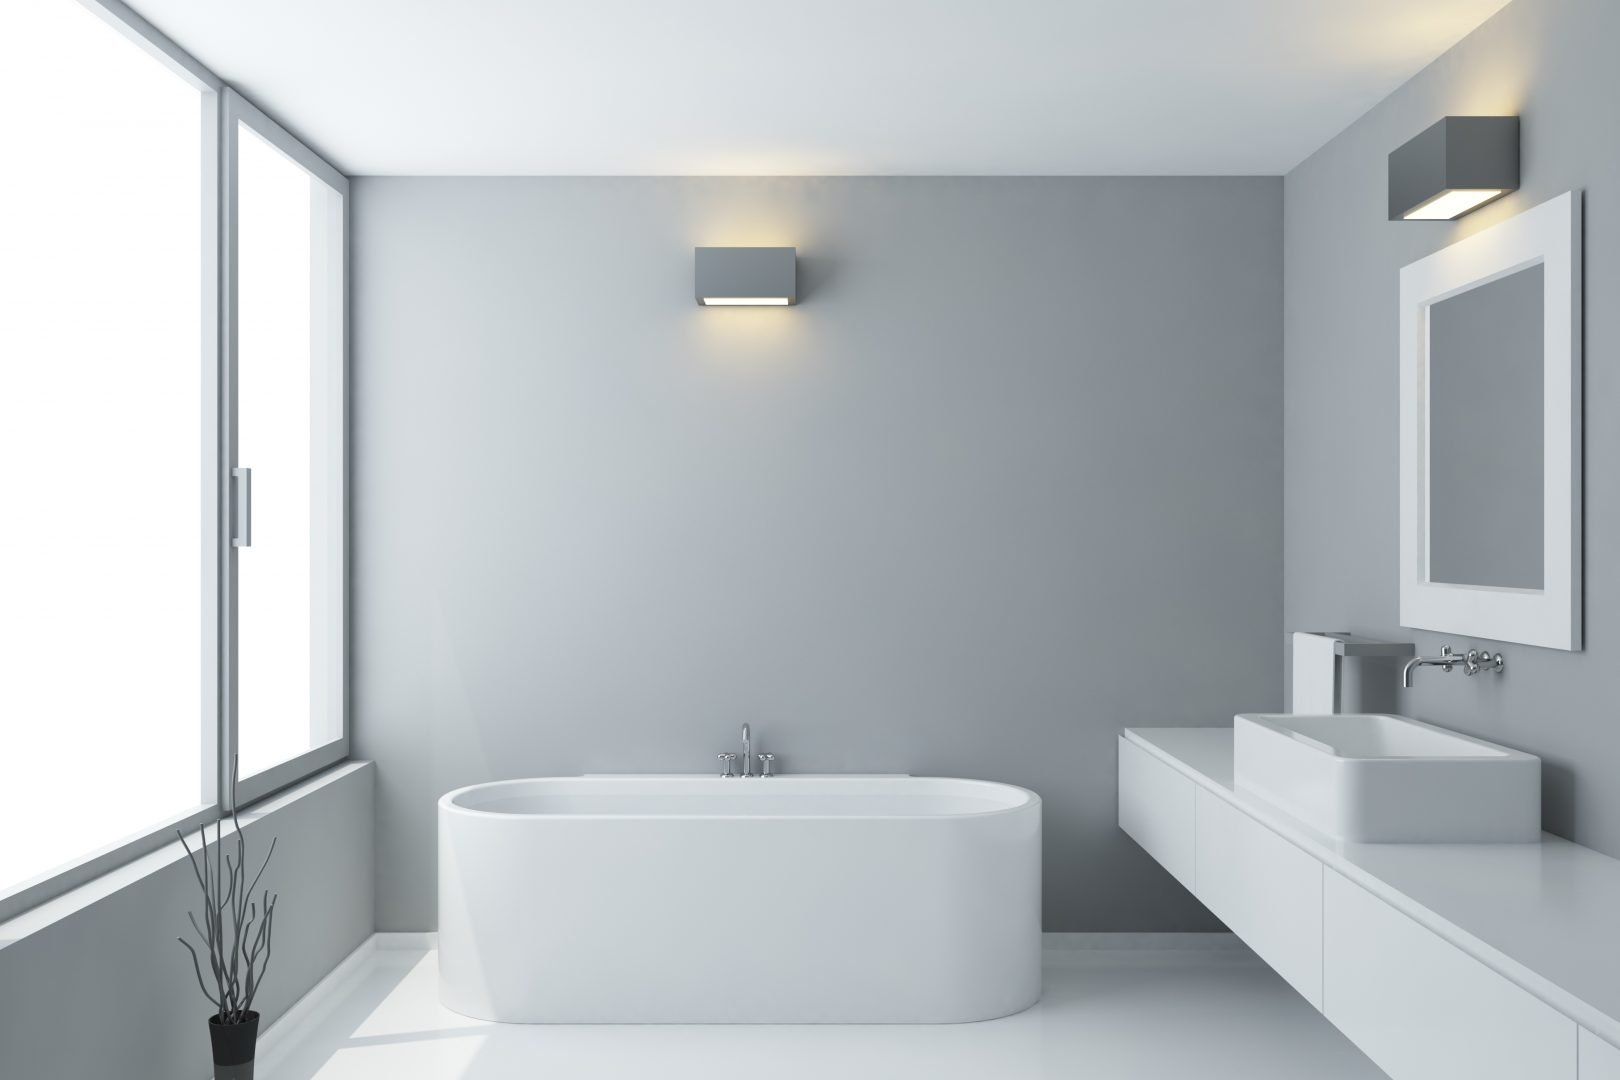 modern bathroom design renovation with solitair bathtub